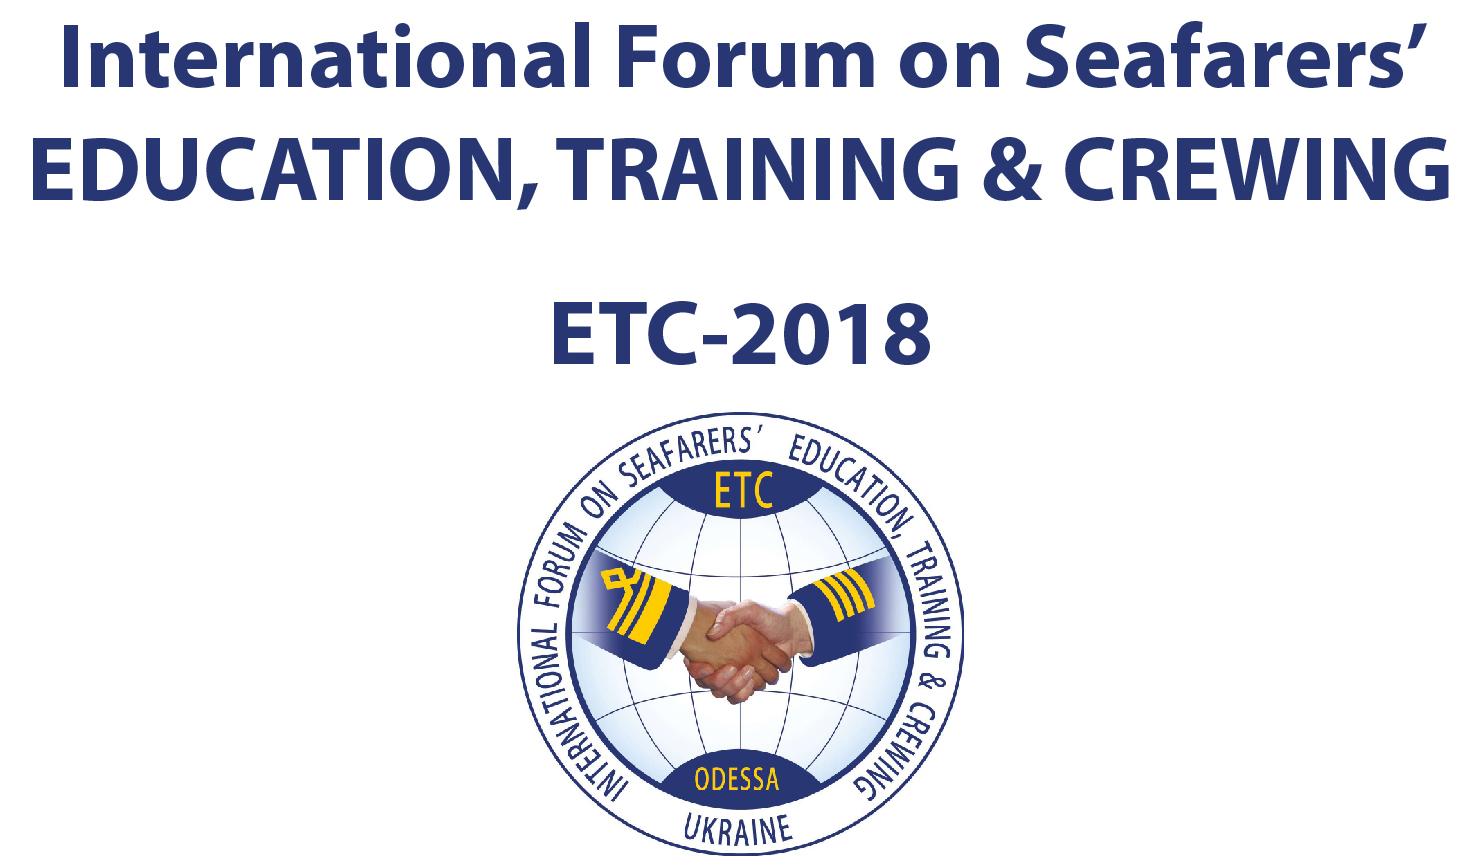 International forum on seafarers' education training crewing